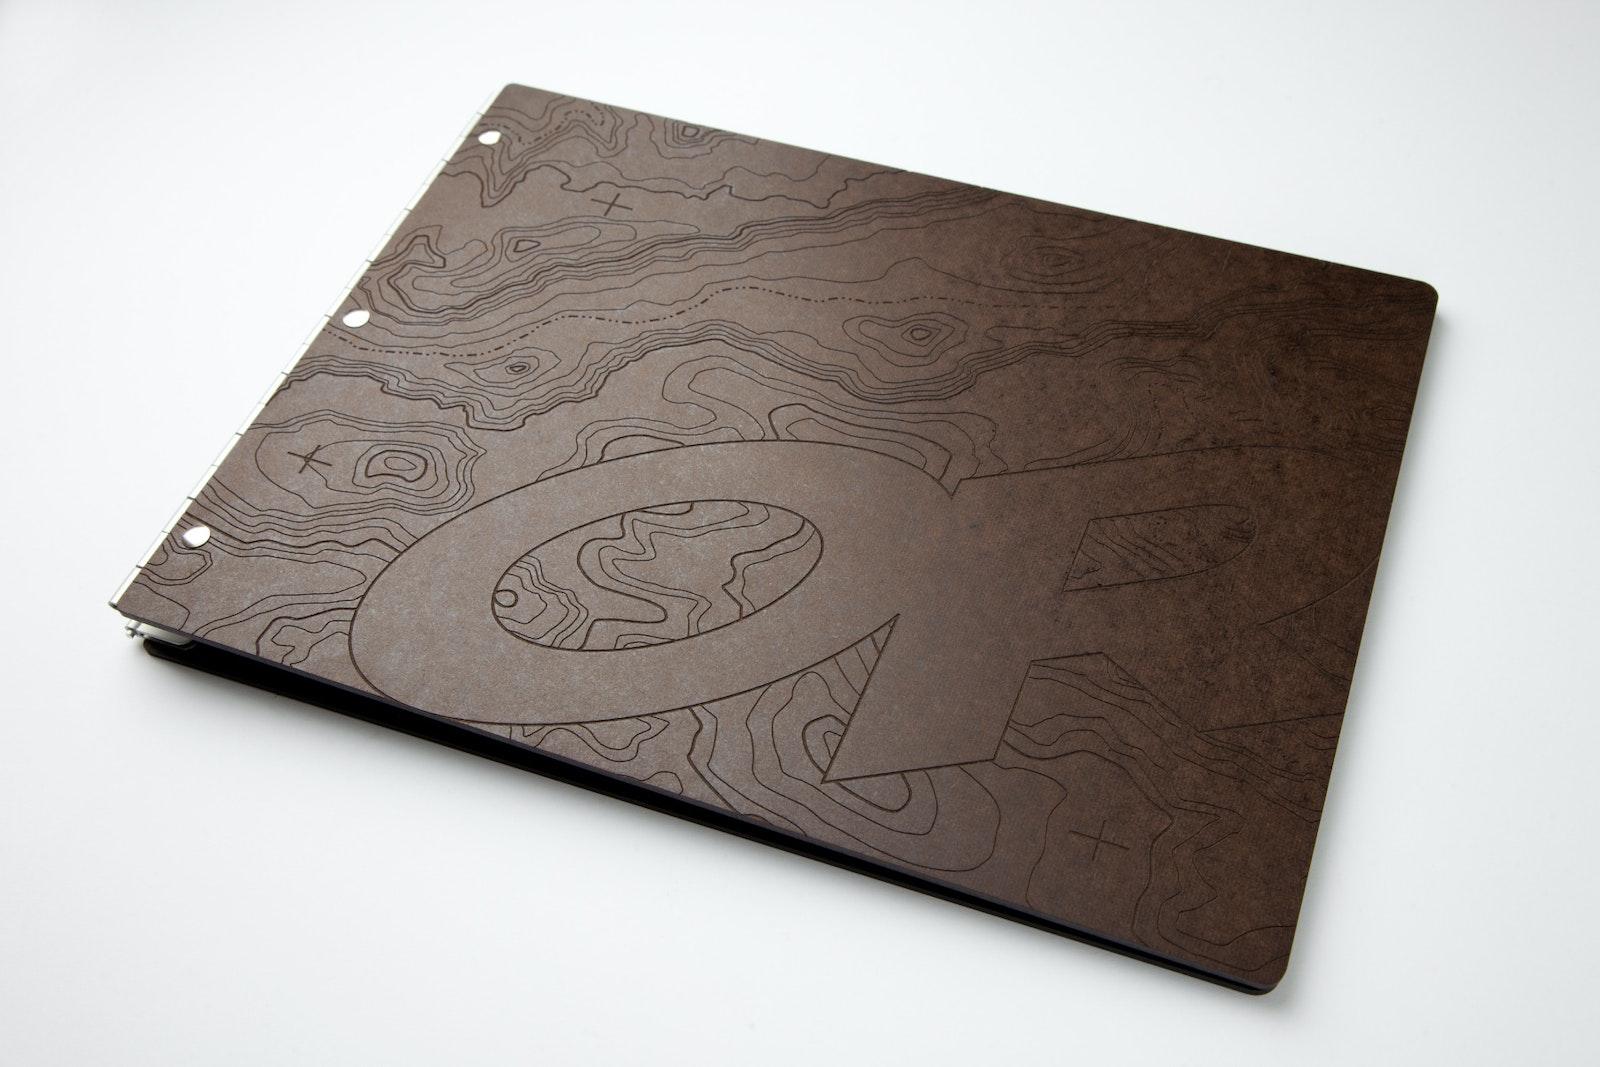 OR Folder